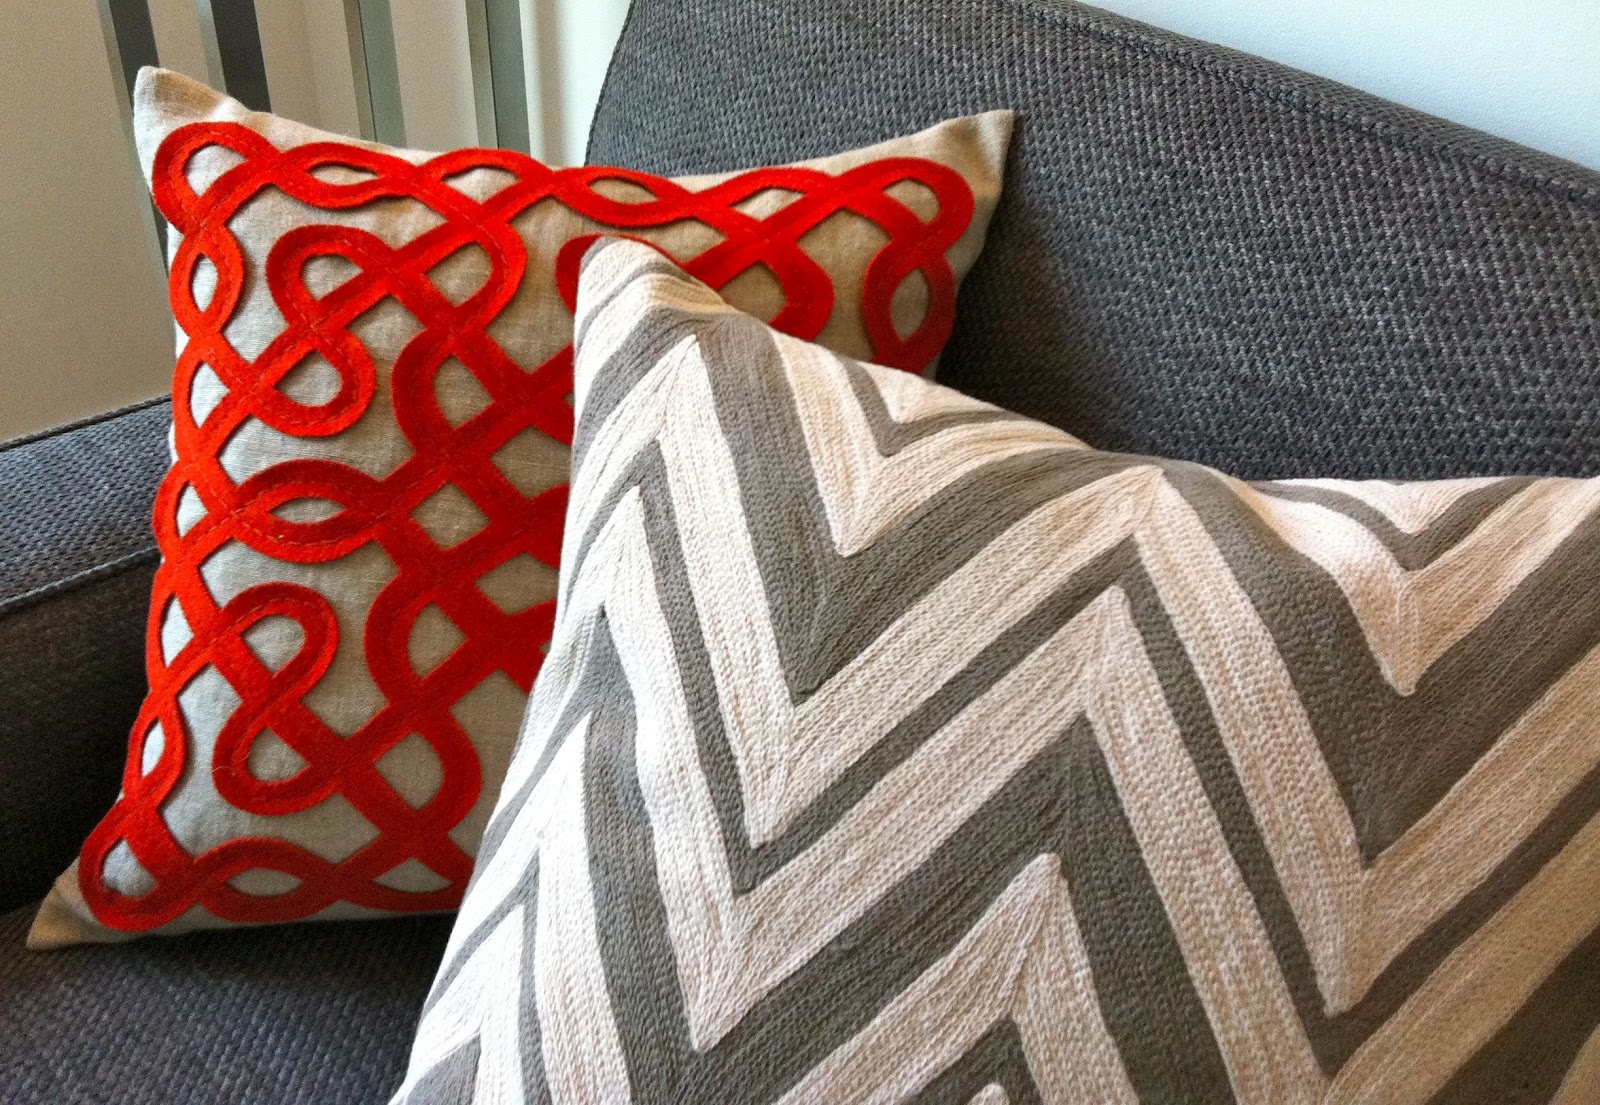 ella modern come on in take a seat - dwell studio new chevron ash pillow dwell studio labyrinth persimmonpillow